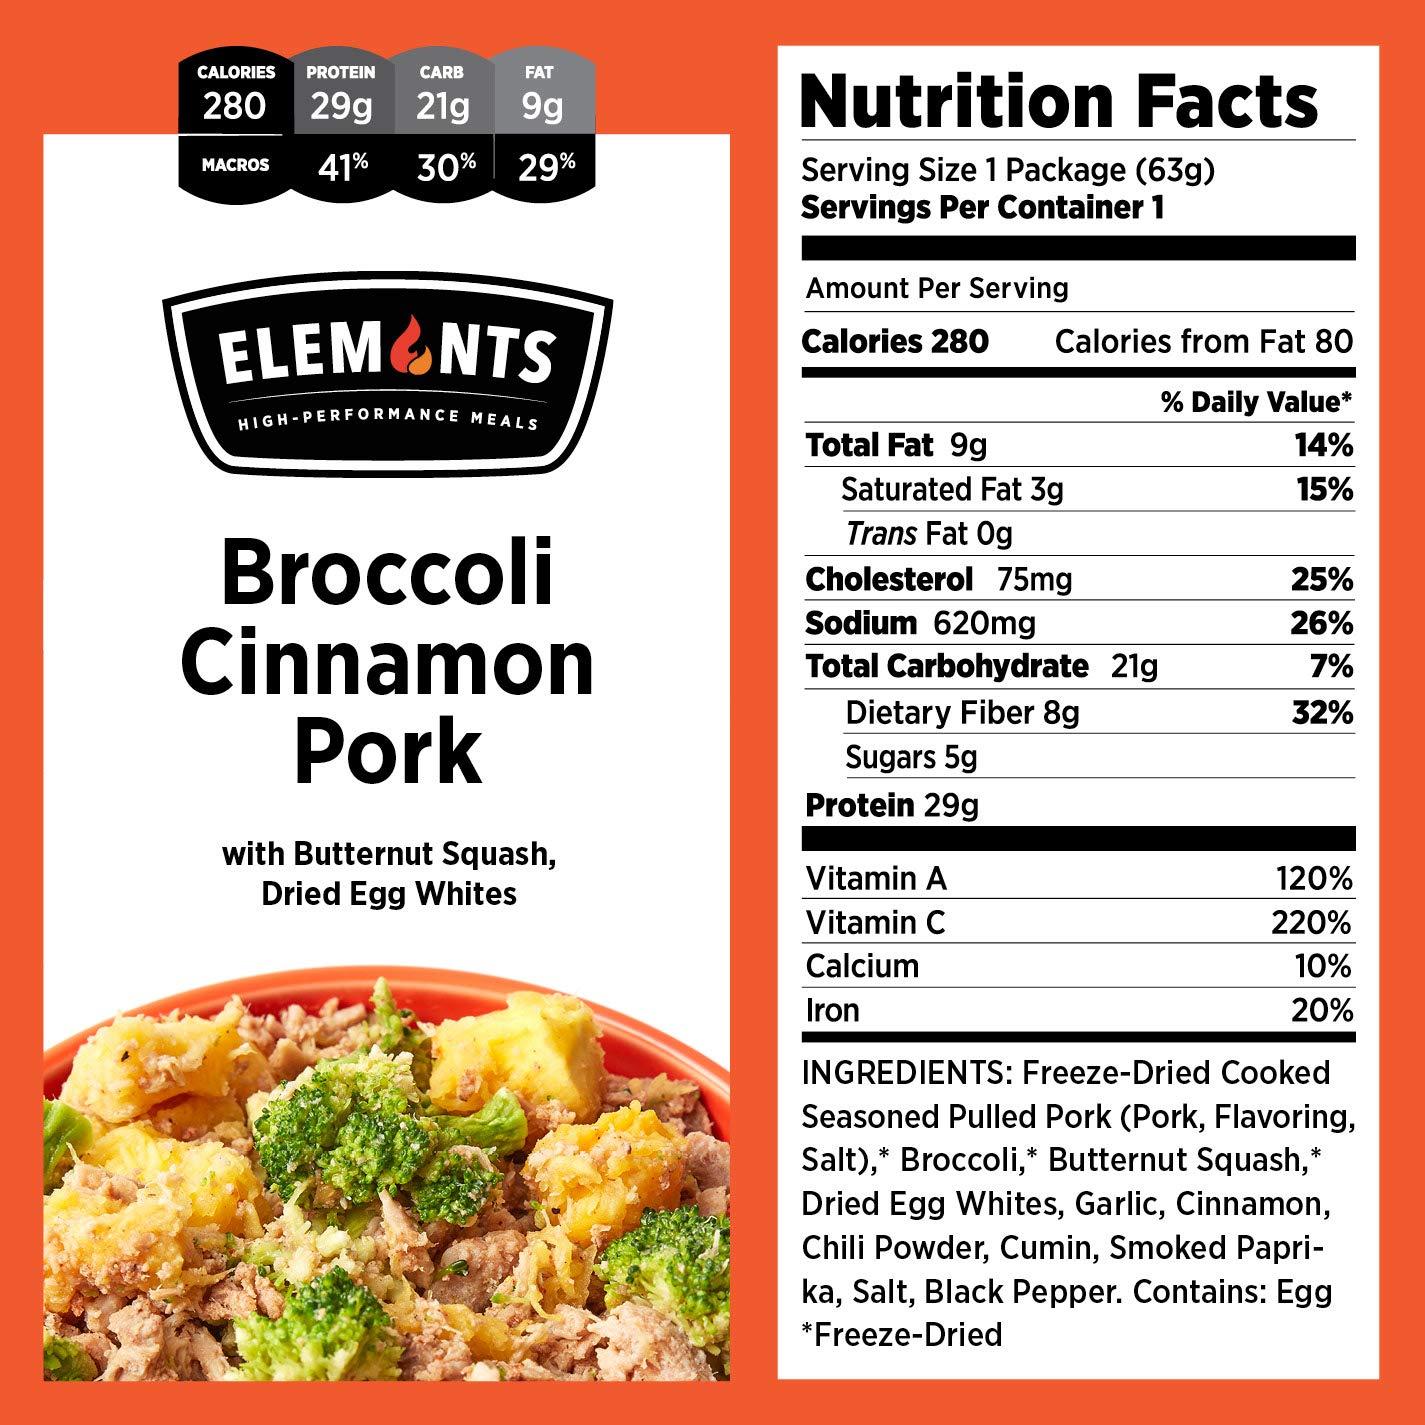 Elements Food, 10-Pack Variety Kit, Balsamic Chicken Pomodoro, Chipotle Turkey Scaramble, Maple Mustard Pork, Broccoli Cinnamon Pork, Sesame Garlic Chicken, Healthy Freeze Dried Food, Paleo Meals